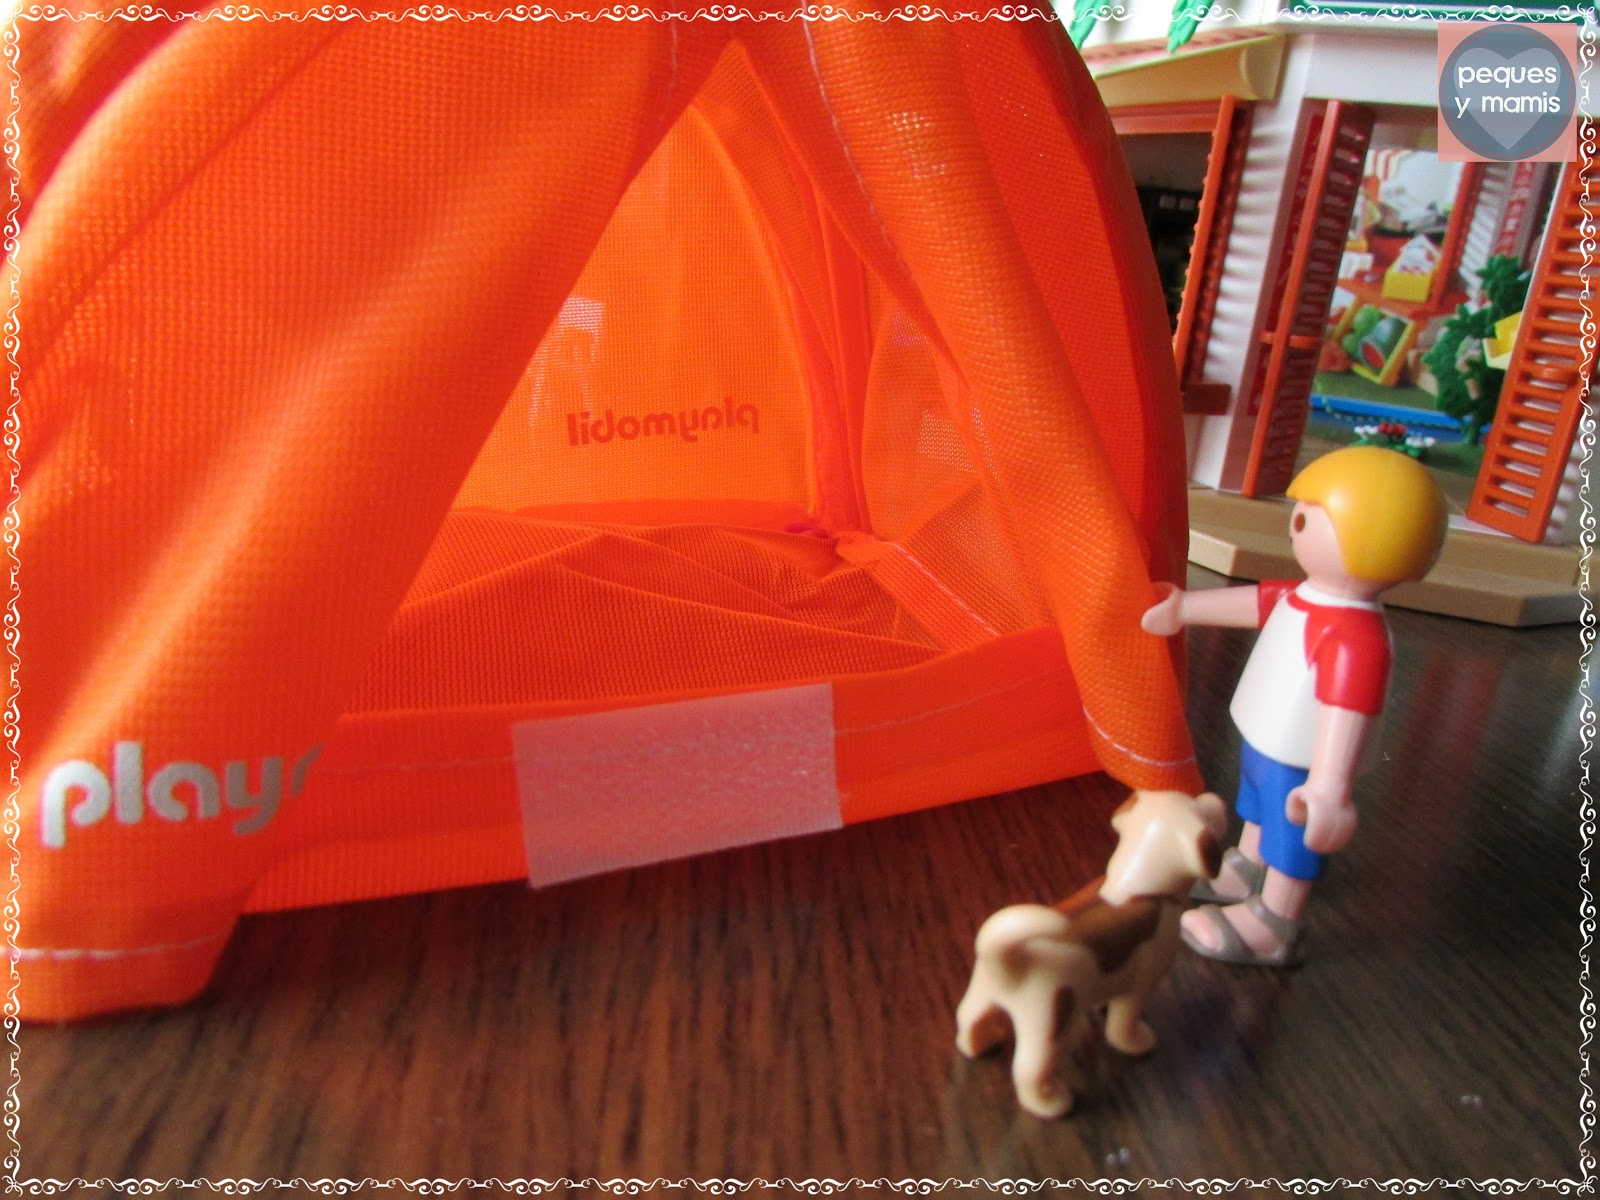 Pequesymamis campamento summer fun de playmobil - Playmobil piscina ballena ...